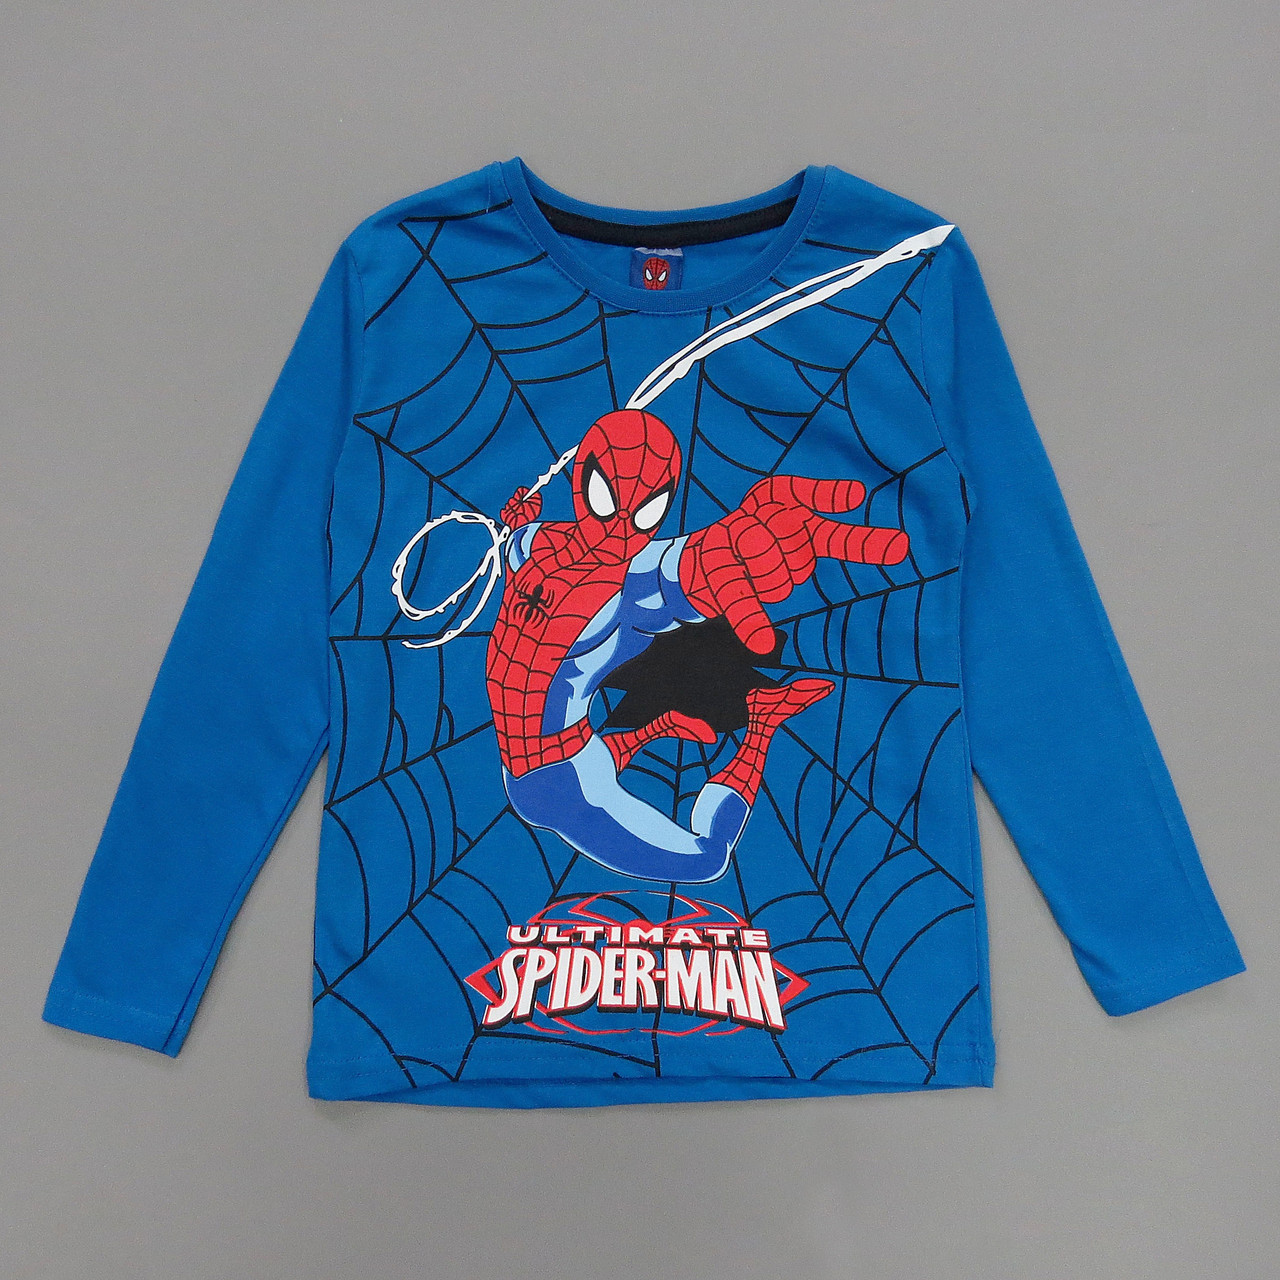 Лонгслив Spiderman для мальчика.